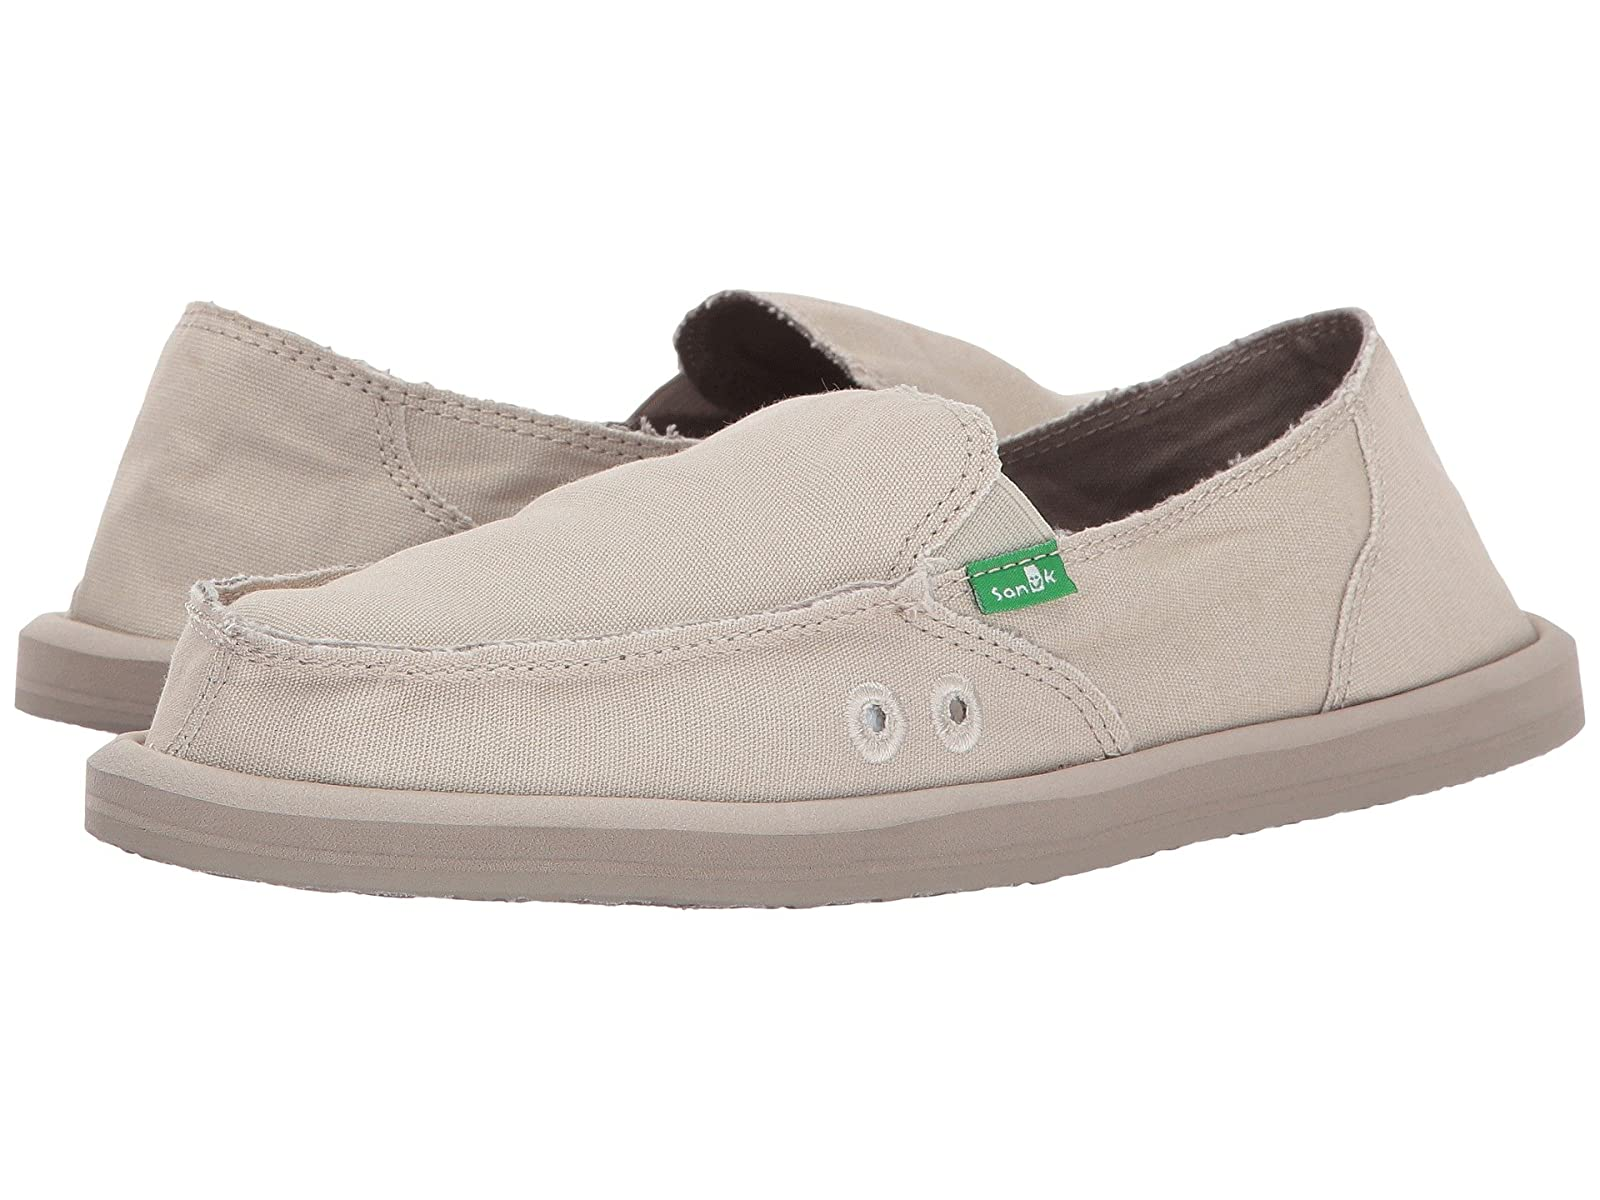 Sanuk Donna DailyAtmospheric grades have affordable shoes